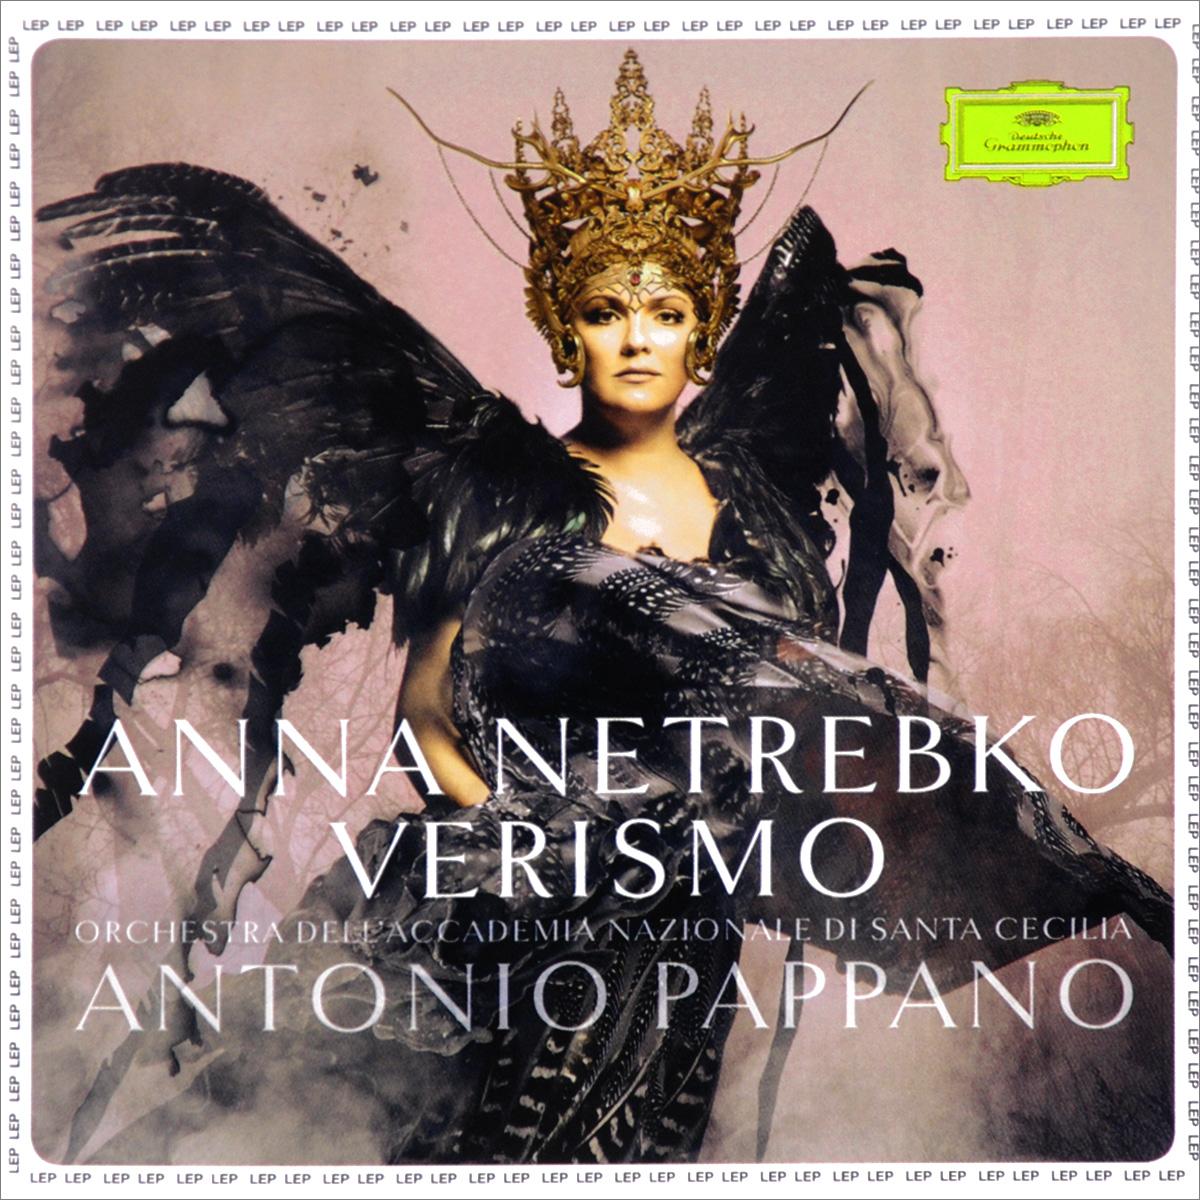 Anna Netrebko, Antonio Pappano. Verismo